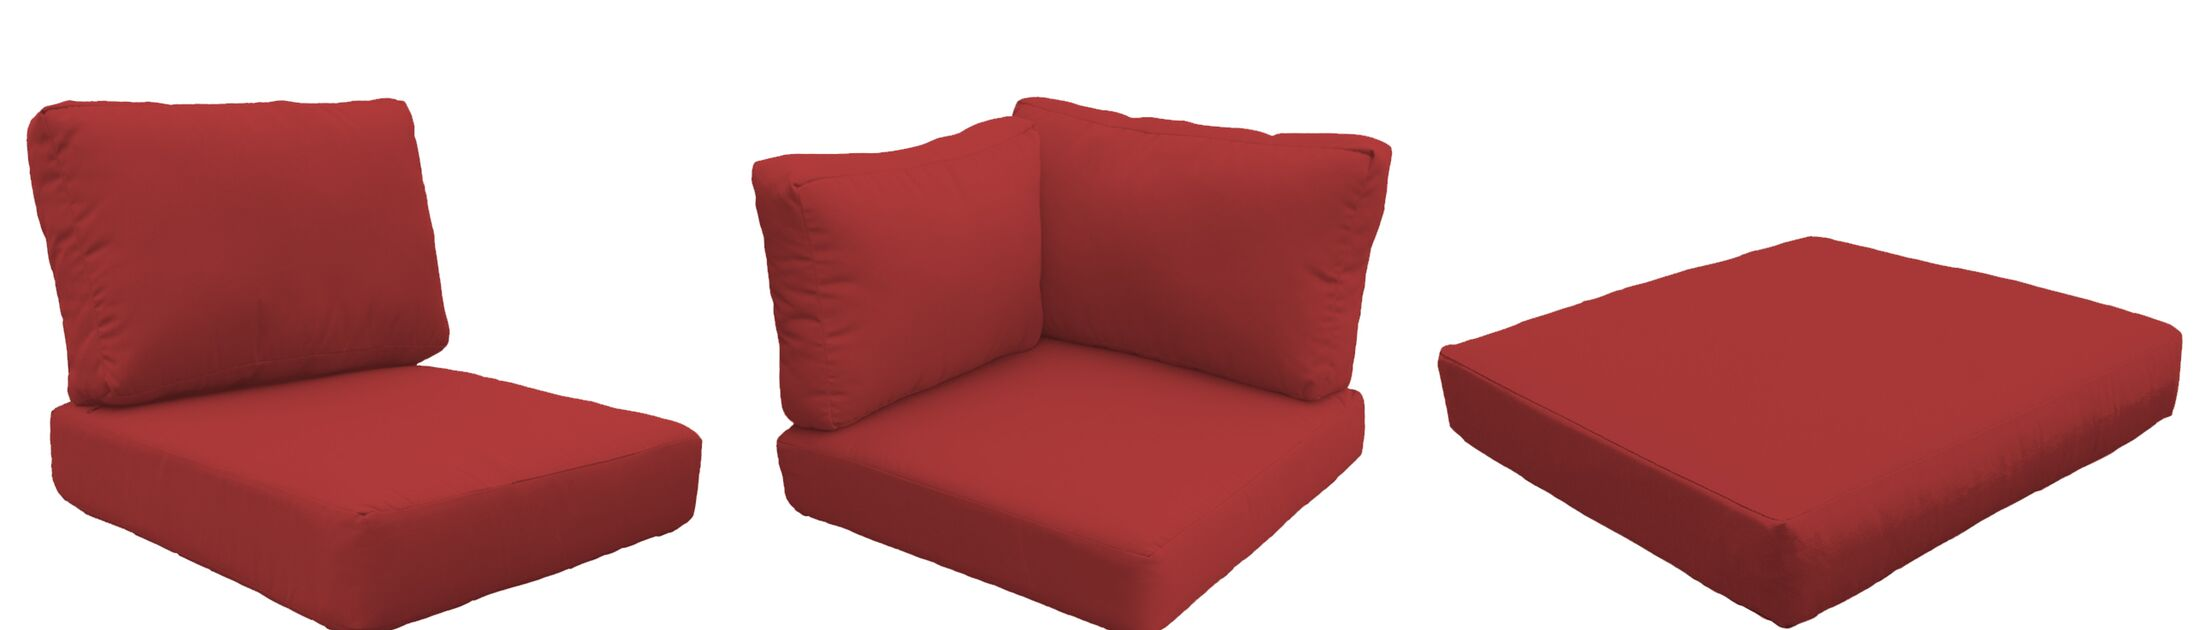 Eldredge 14 Piece Outdoor Cushion Set Fabric: Terracotta